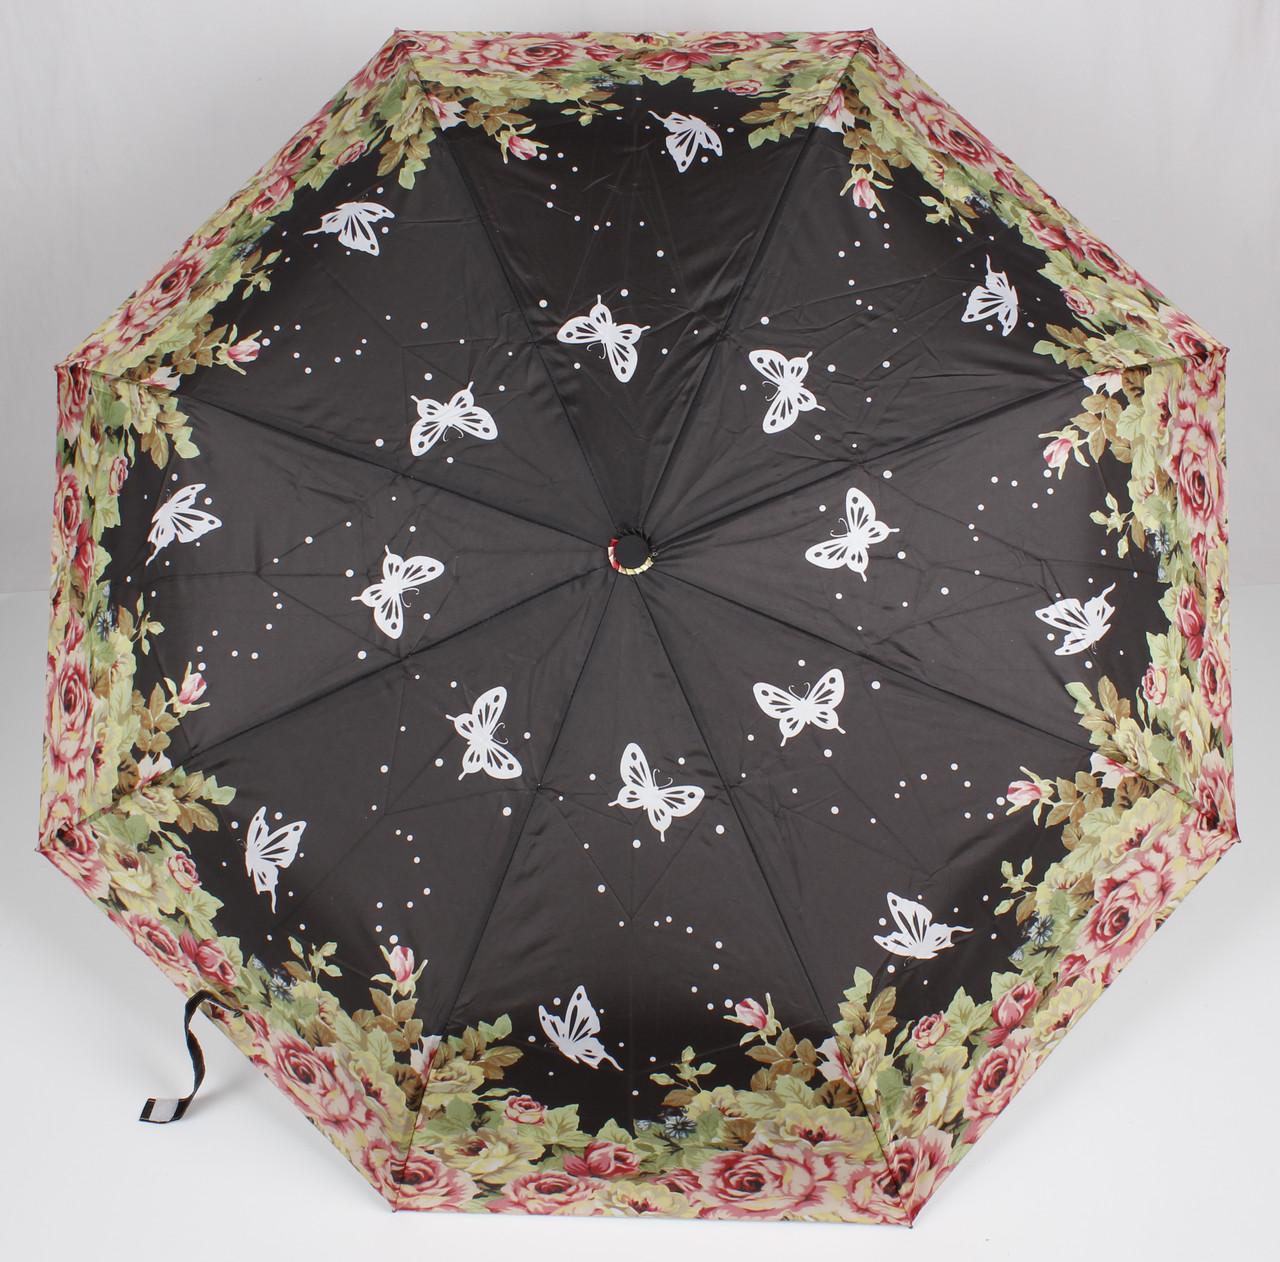 Зонт женский полуавтомат бабочки Mario